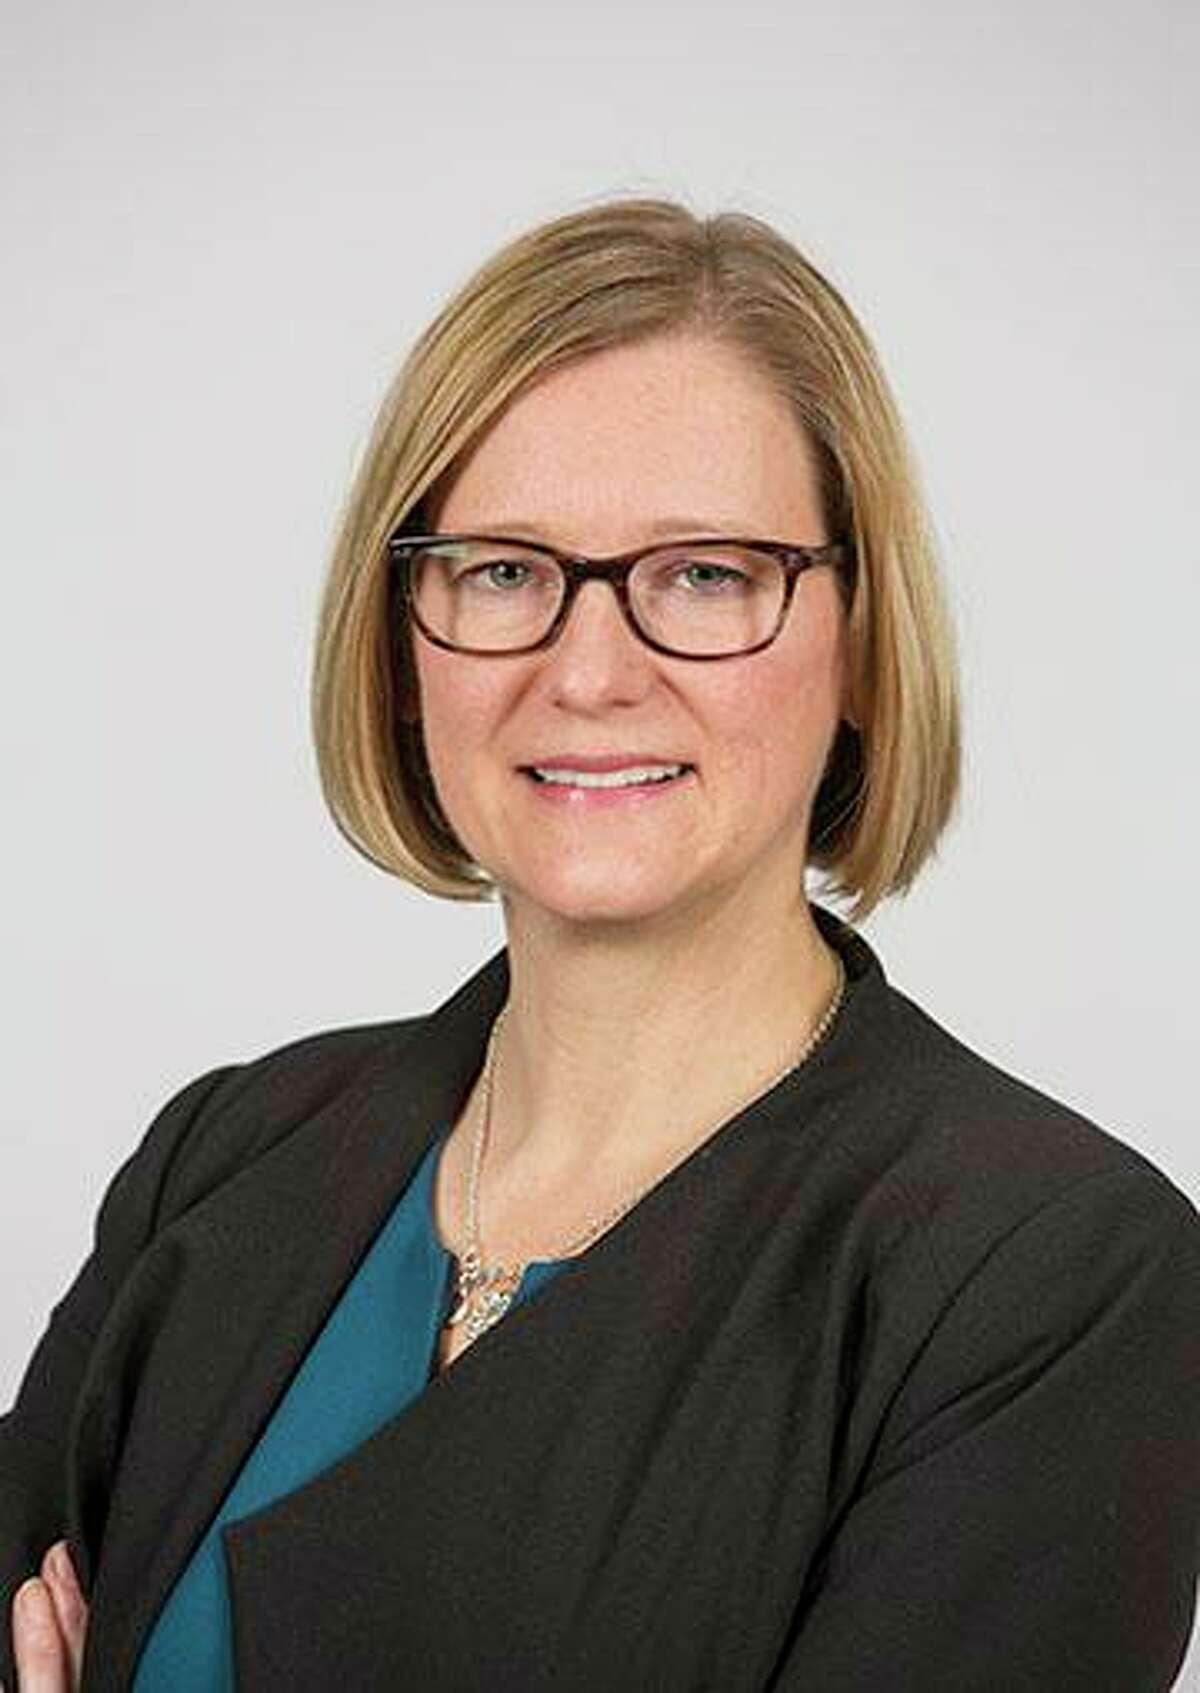 Christina Johansen is a senior vice president at TechnipFMC.